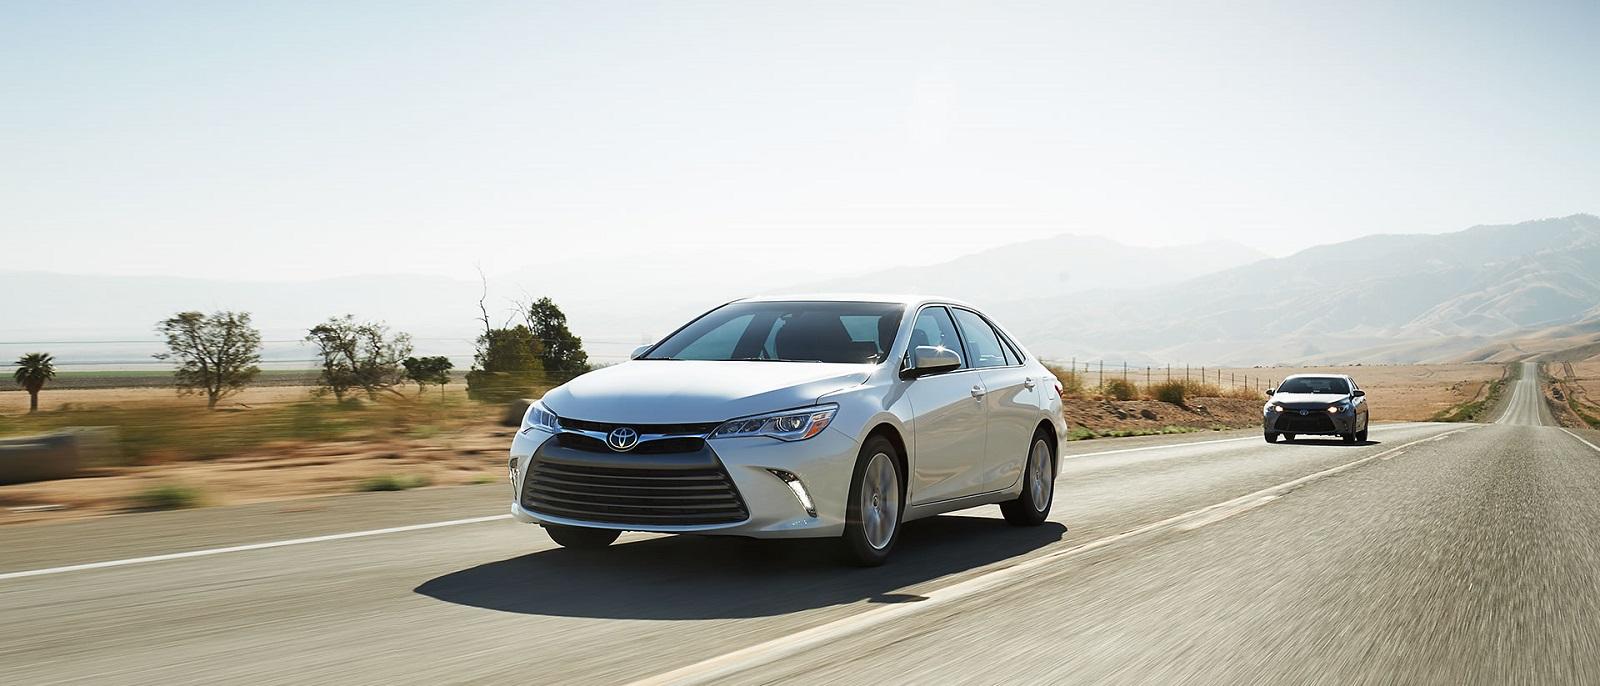 2017 Toyota Camry white exterior